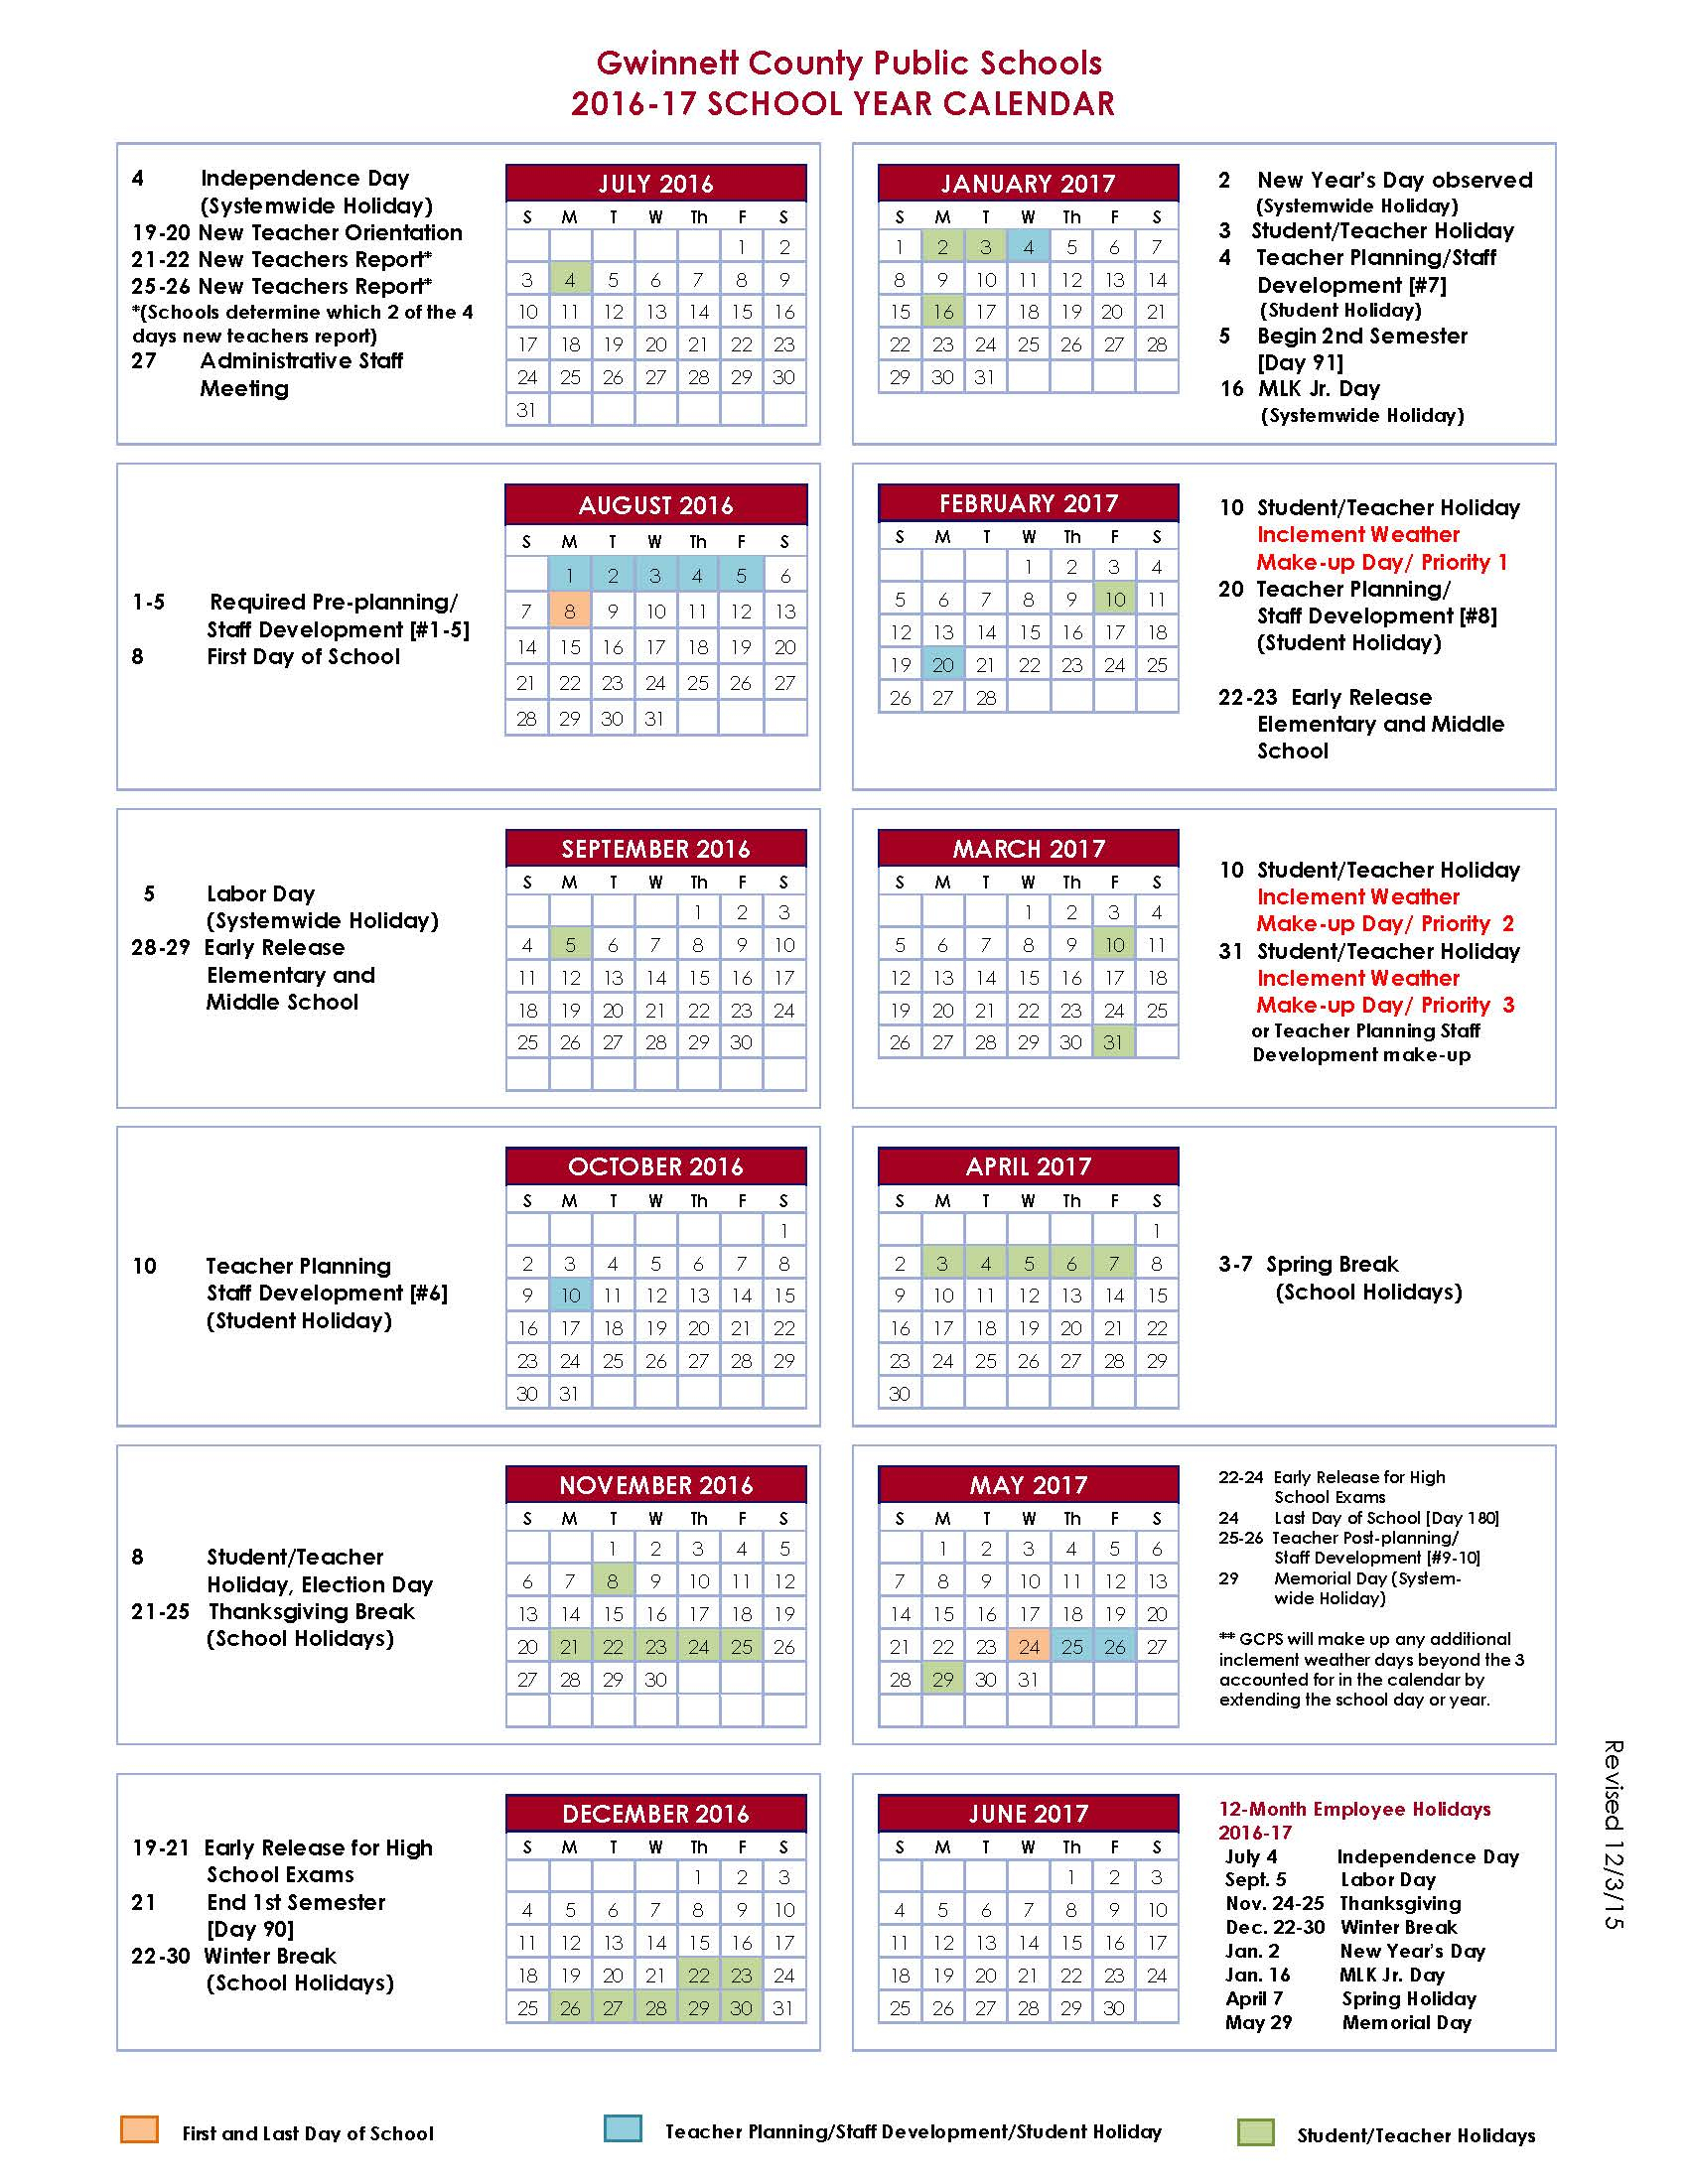 Gwinnett County School Calendar 2016-2017   Nalley Ford